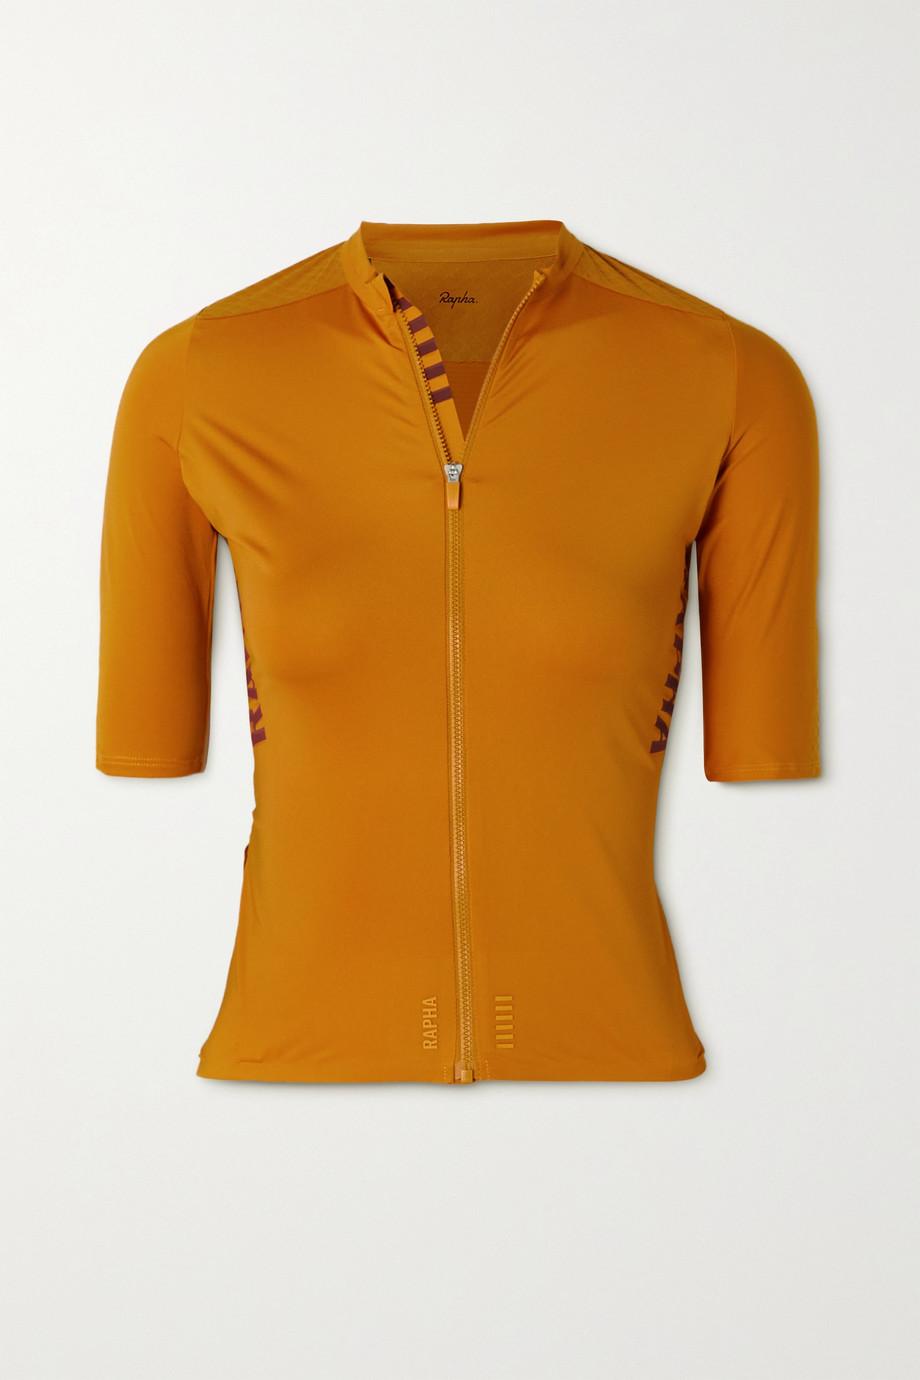 Rapha Pro Team Aero stretch cycling jersey